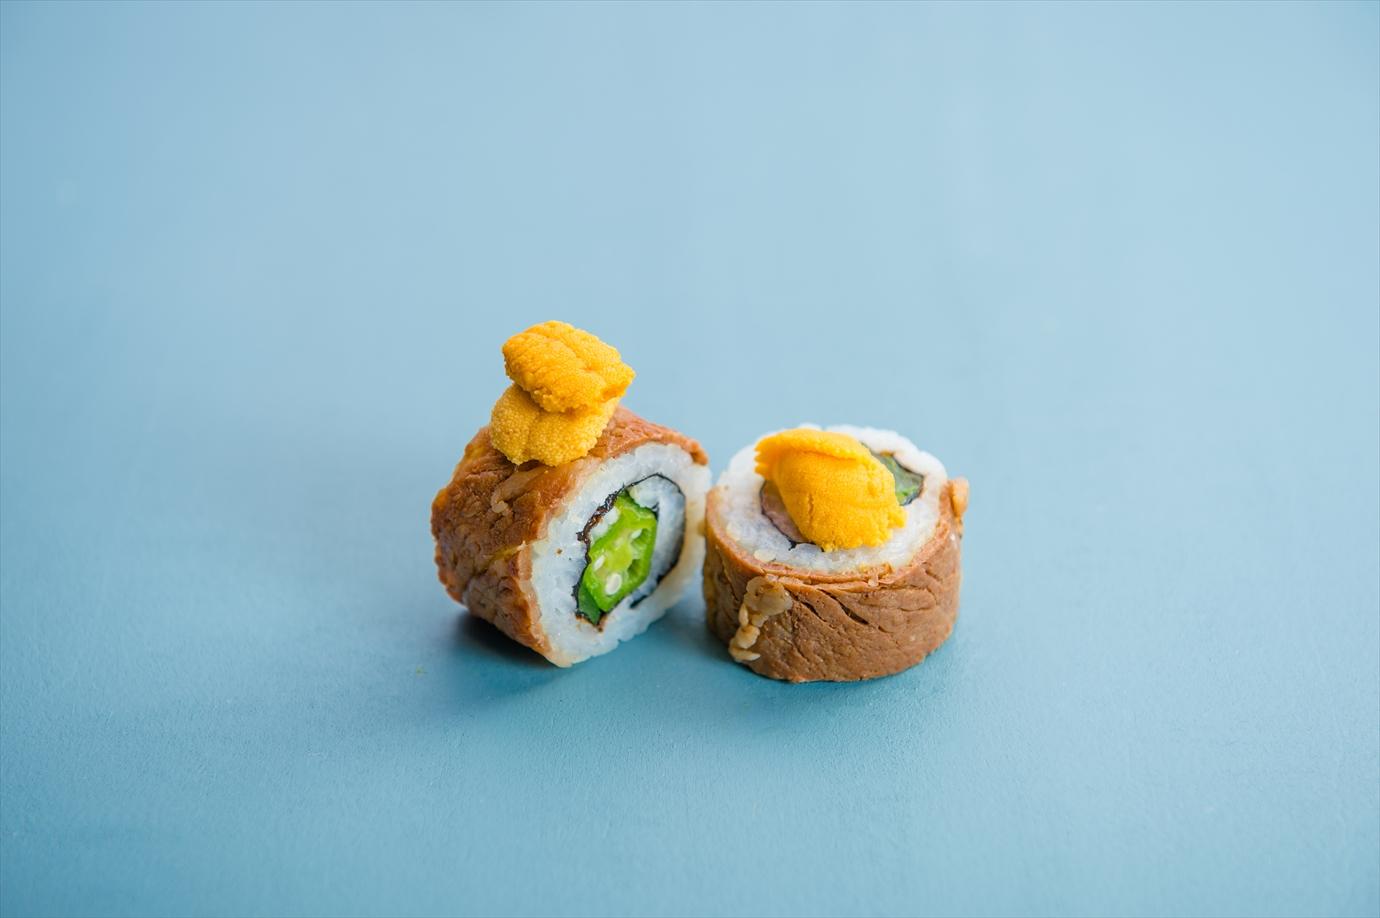 shari-the-tokyo-sushi-bar%e3%80%90%e3%83%ad%e3%83%bc%e3%83%ab%e5%af%bf%e5%8f%b8%e3%80%91%e7%89%9b%e7%82%99%e3%82%8a%e3%83%ad%e3%83%bc%e3%83%ab-%e7%94%9f%e9%9b%b2%e4%b8%b9%e6%b7%bb%e3%81%88